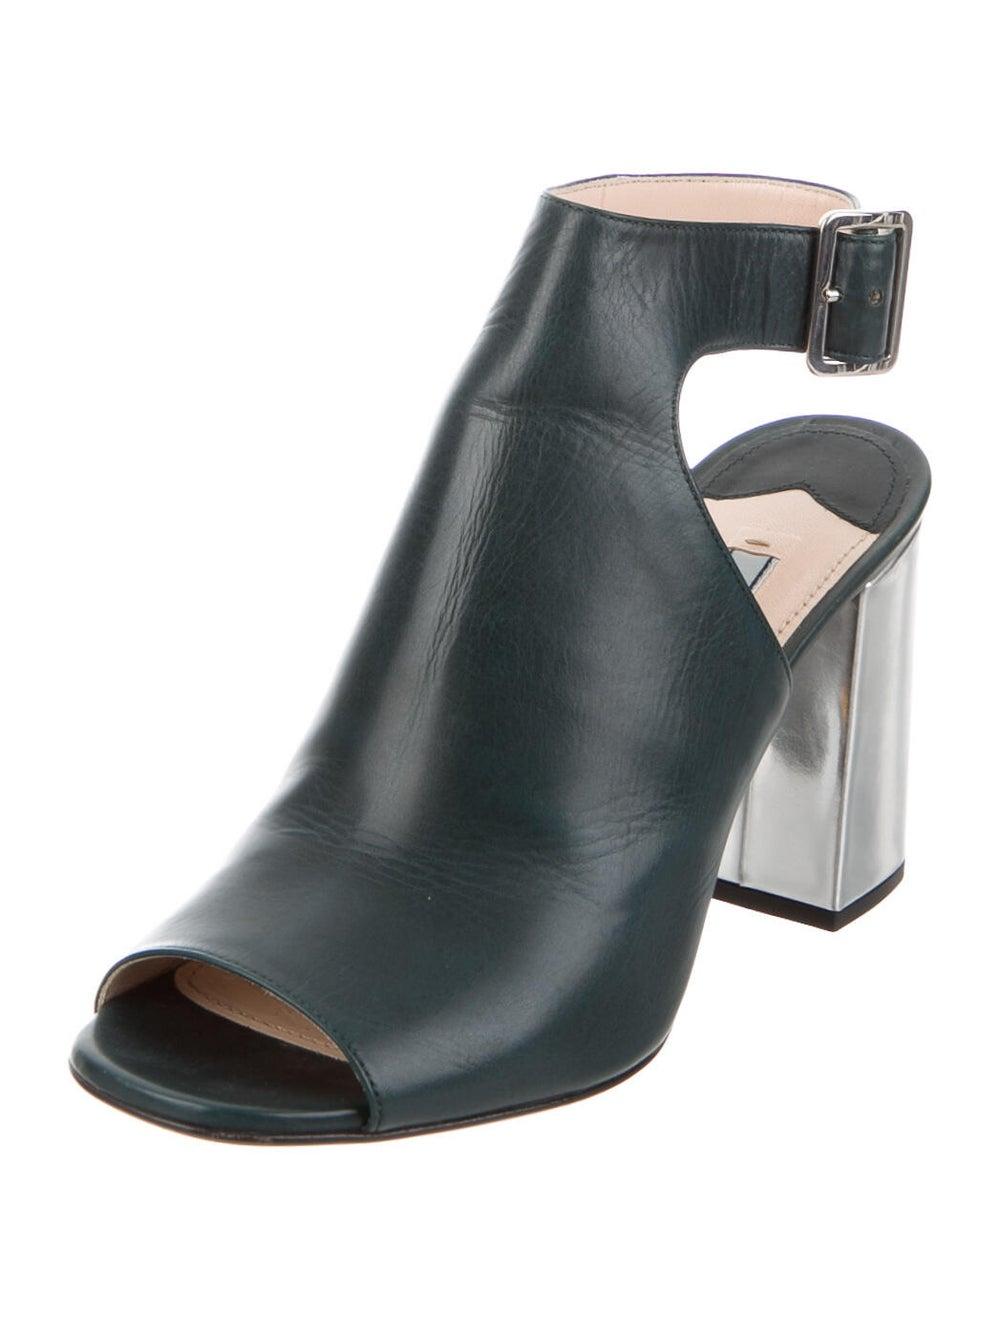 Prada Leather Boots Green - image 2